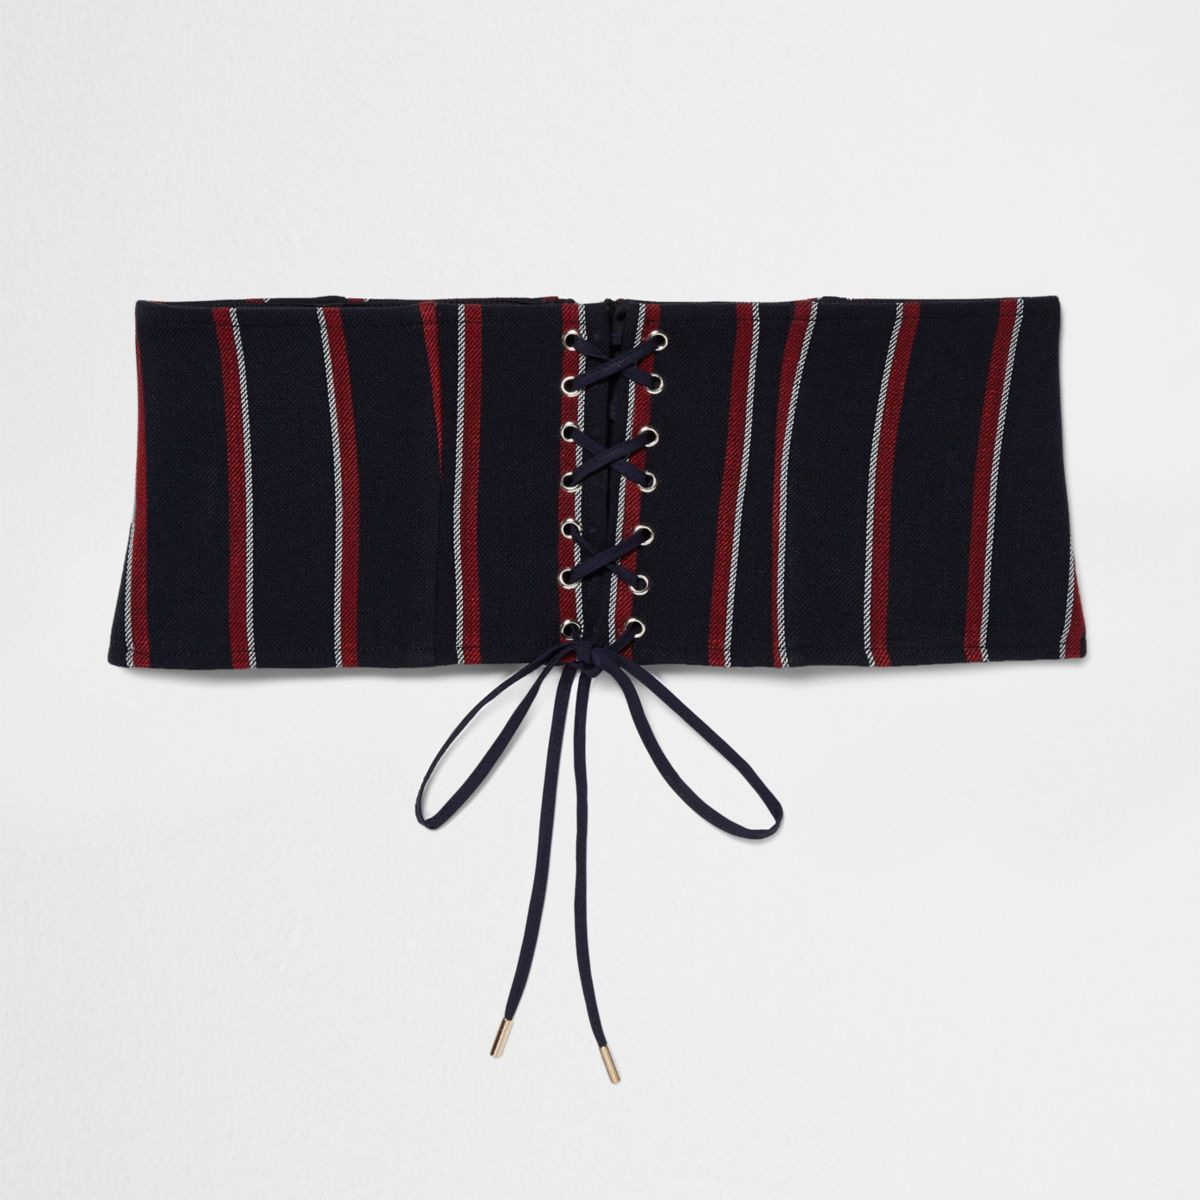 Blauw met rood gestreepte brede riem met corsetsluiting